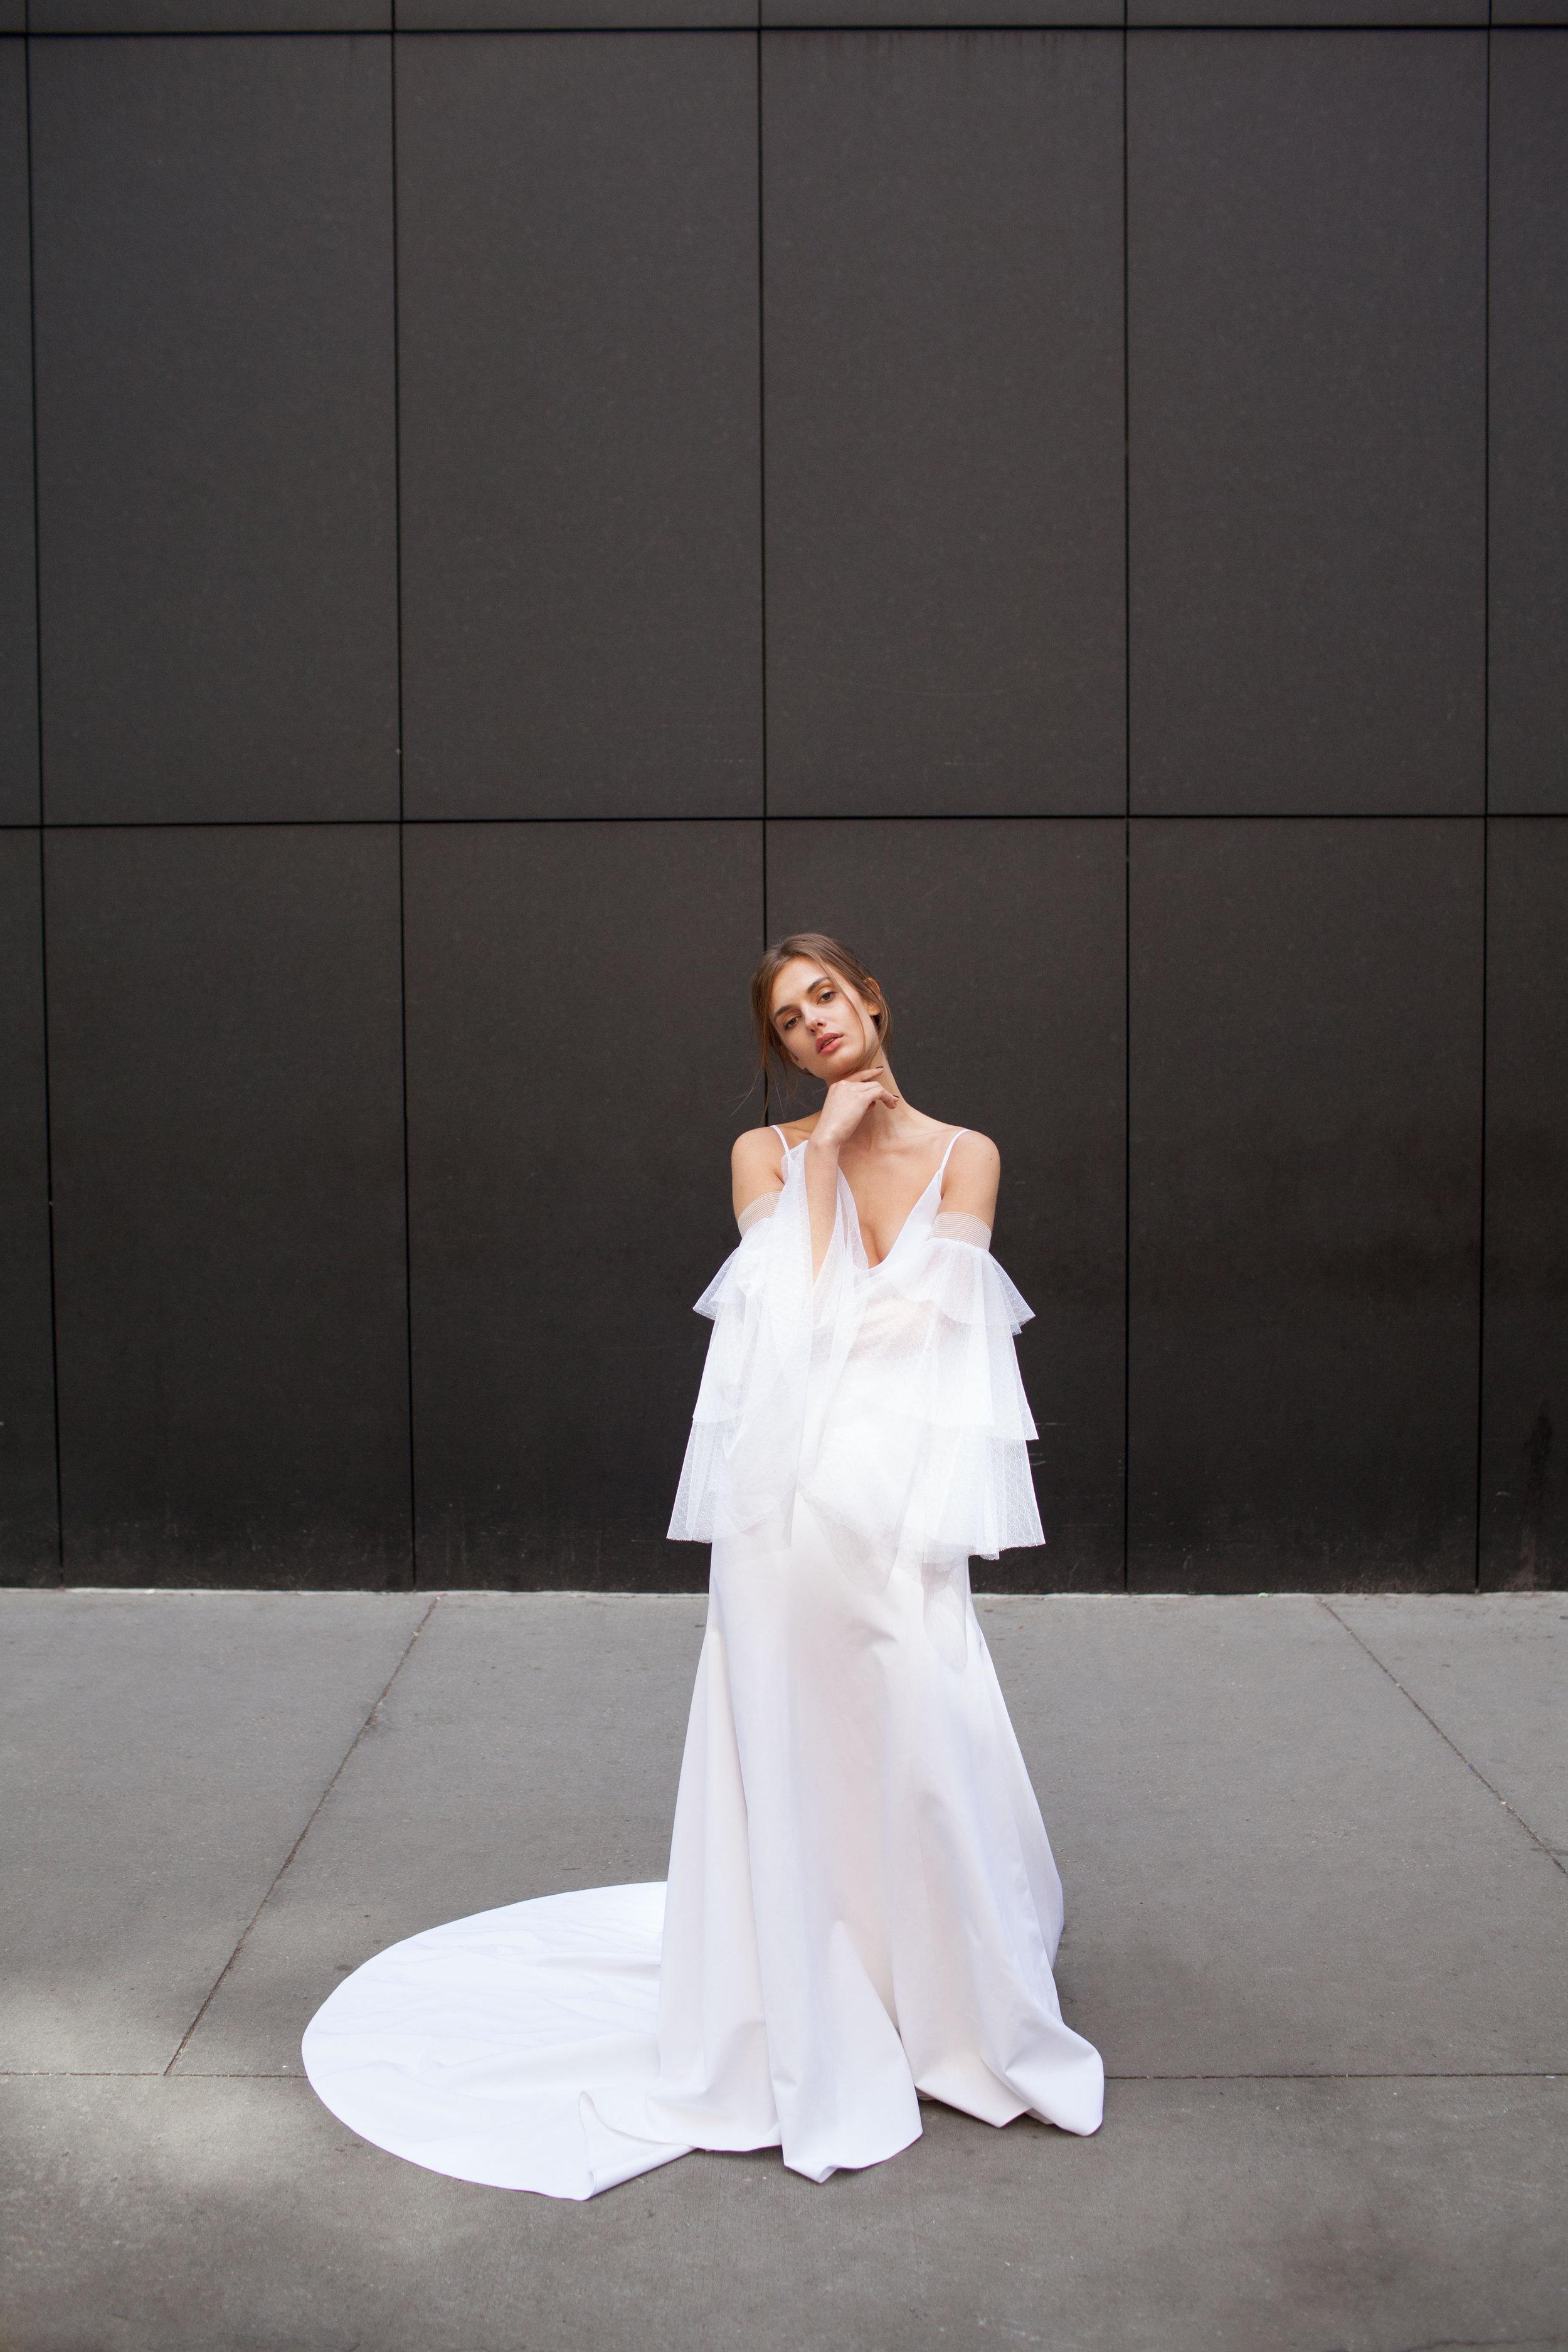 6.Samantha Sleeper - Natalie Probst Photography 043.jpg